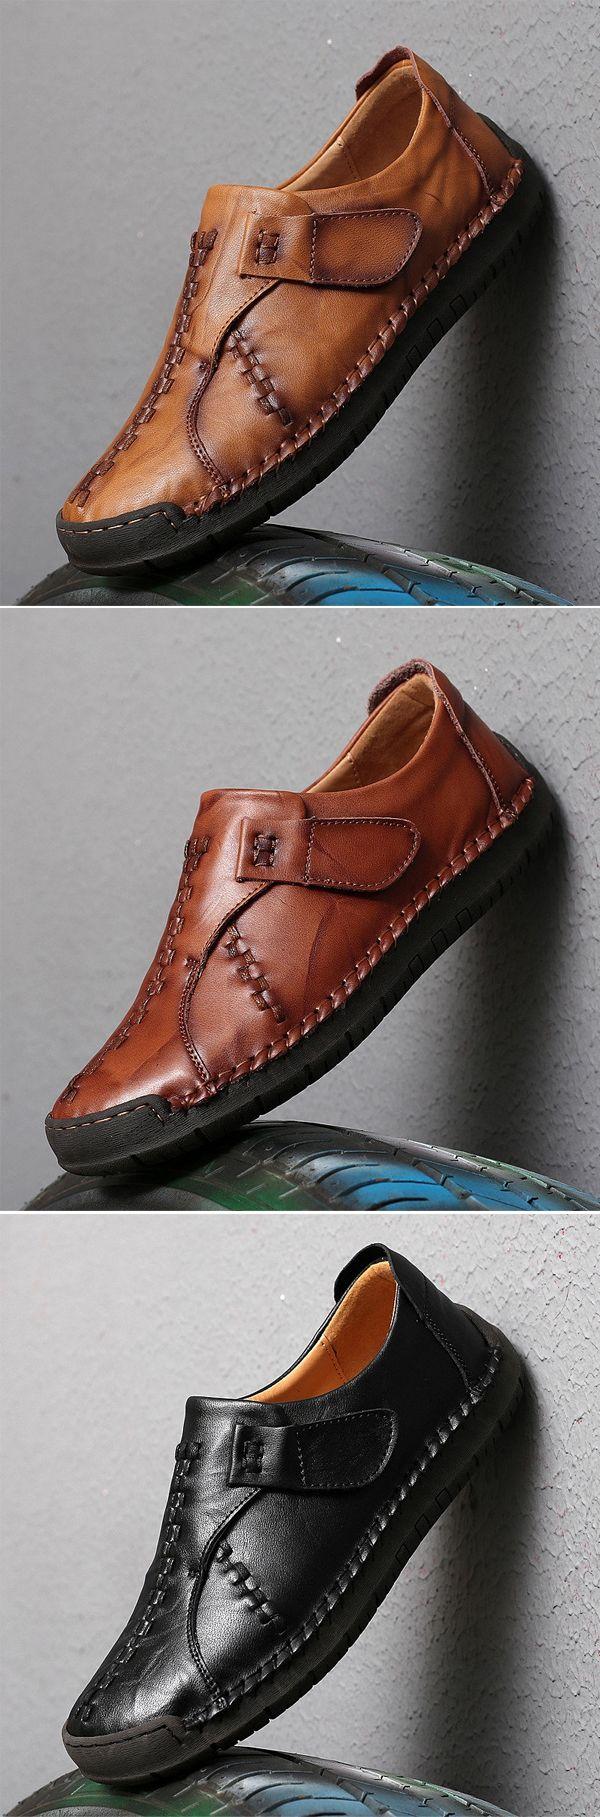 US$43.8 Men's Vintage Hand Stitcing Hook-Loop Genuine Leather Loafers